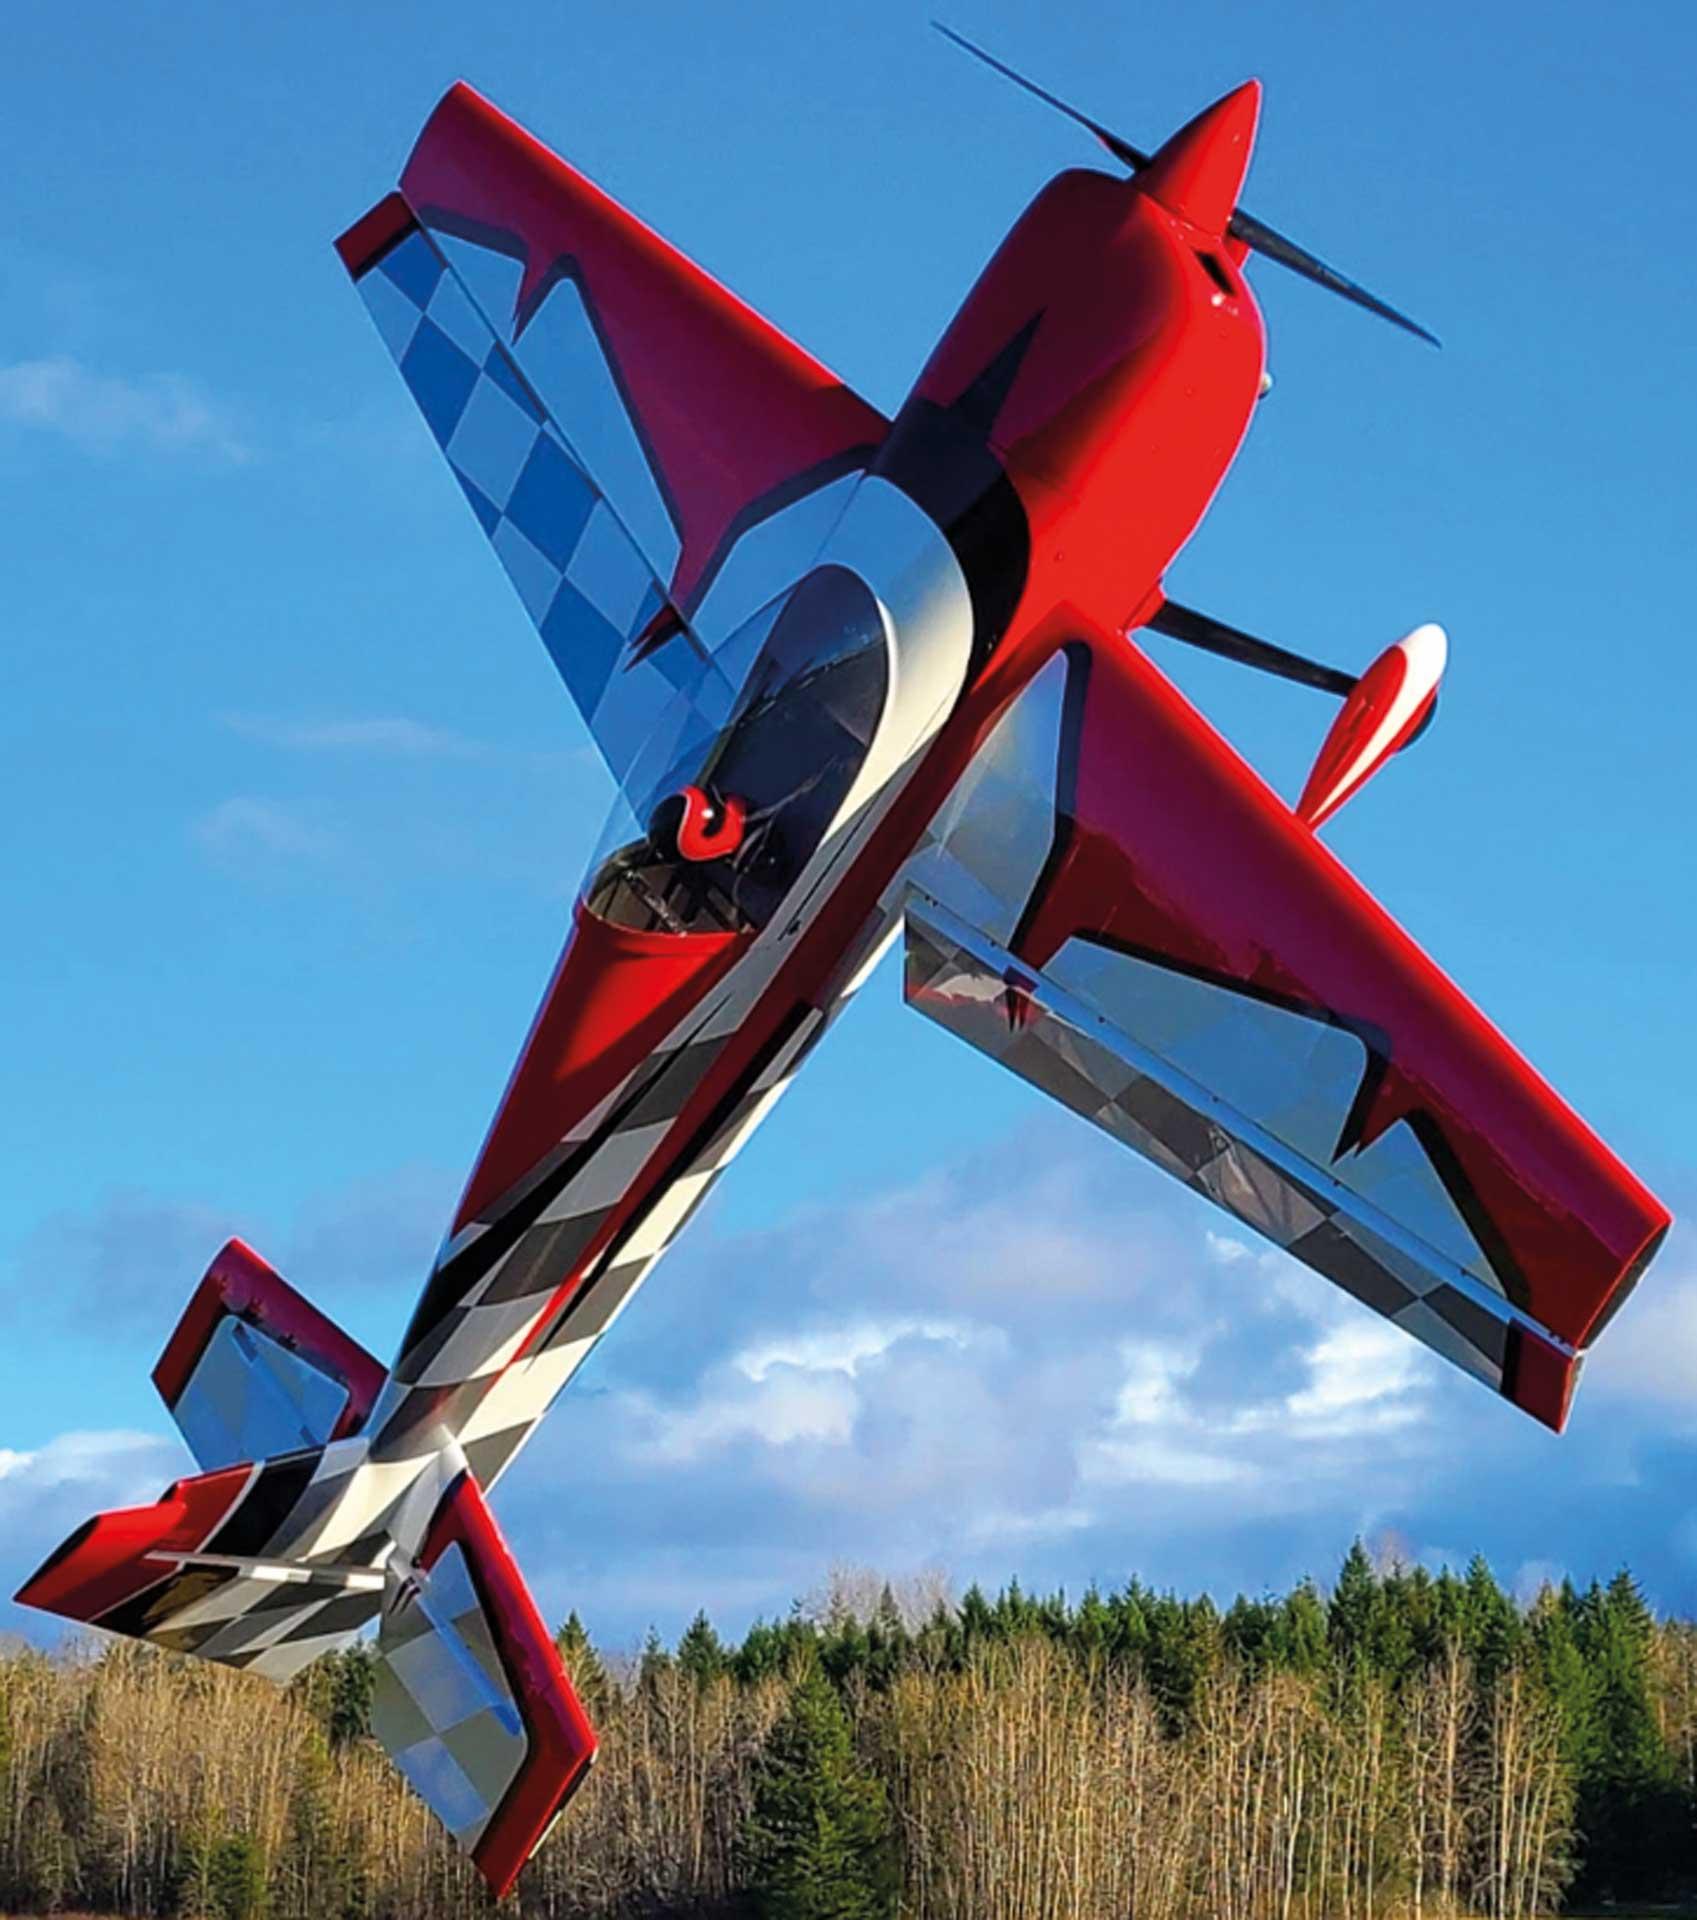 "EXTREMEFLIGHT-RC SLICK 114"" Rot/Weiss ARF"